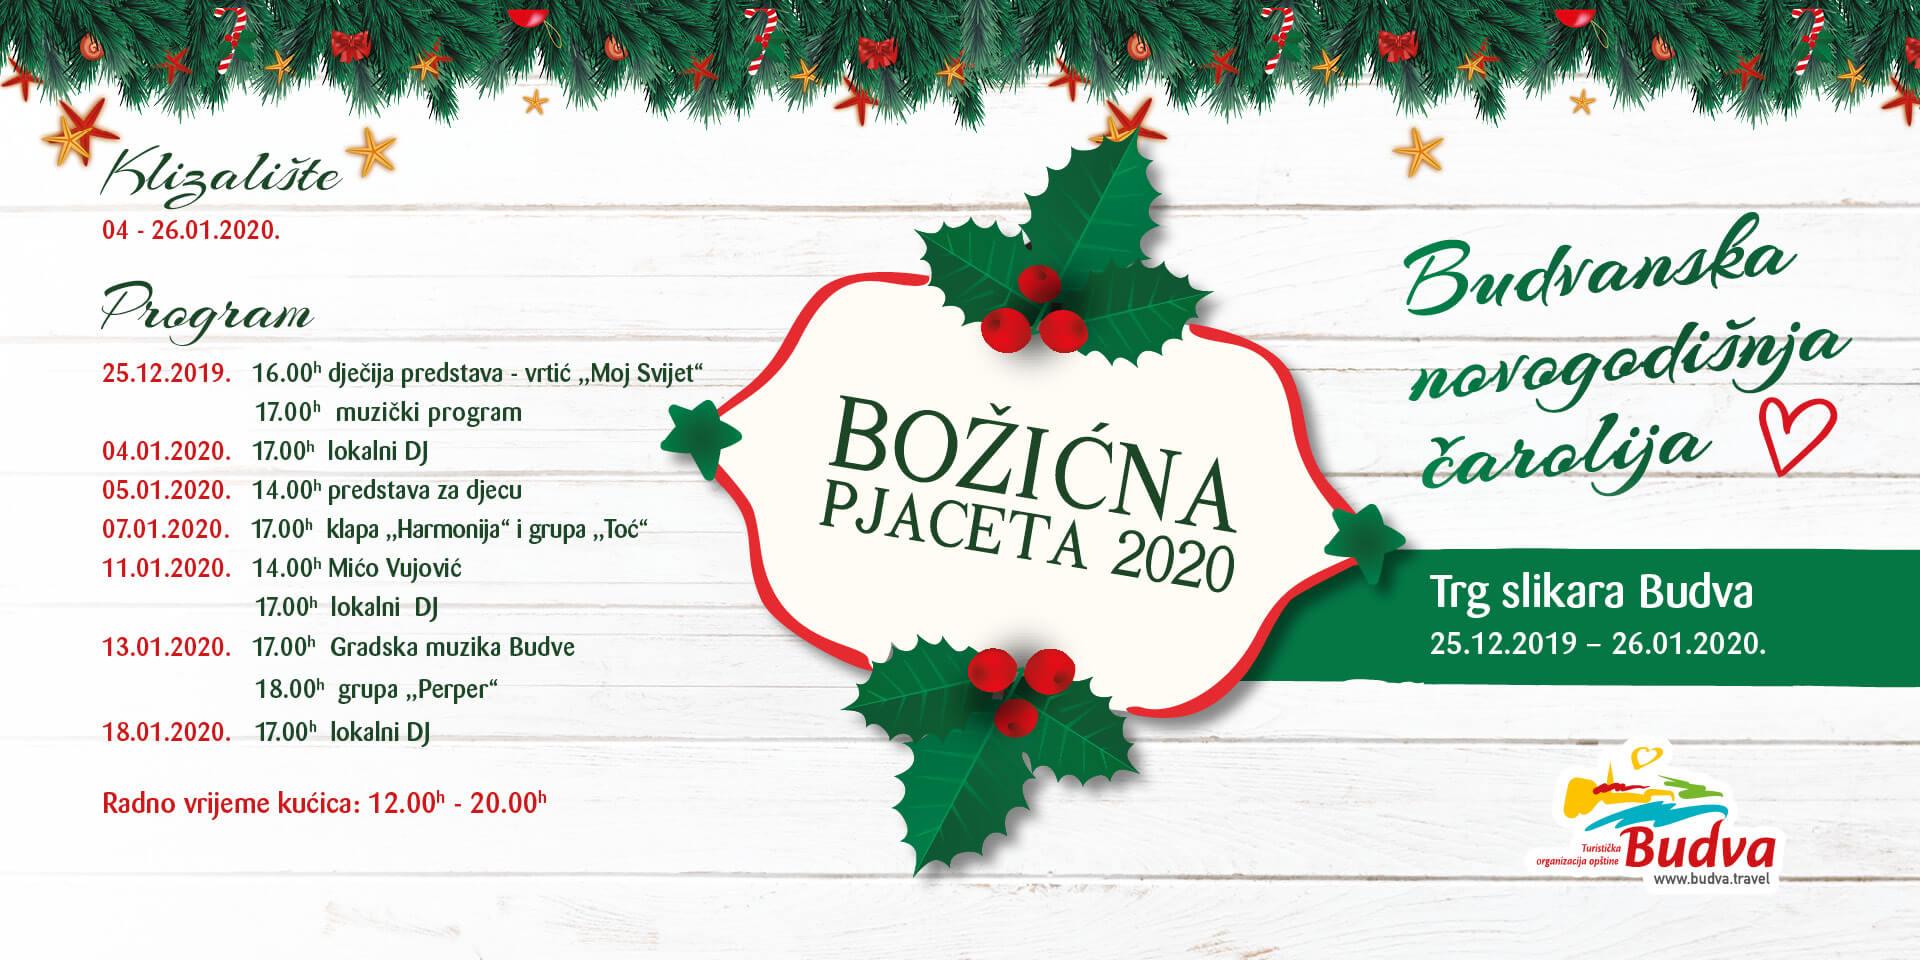 budva-food budva-nightlife budva-apartments budva-events budva-registration-fee